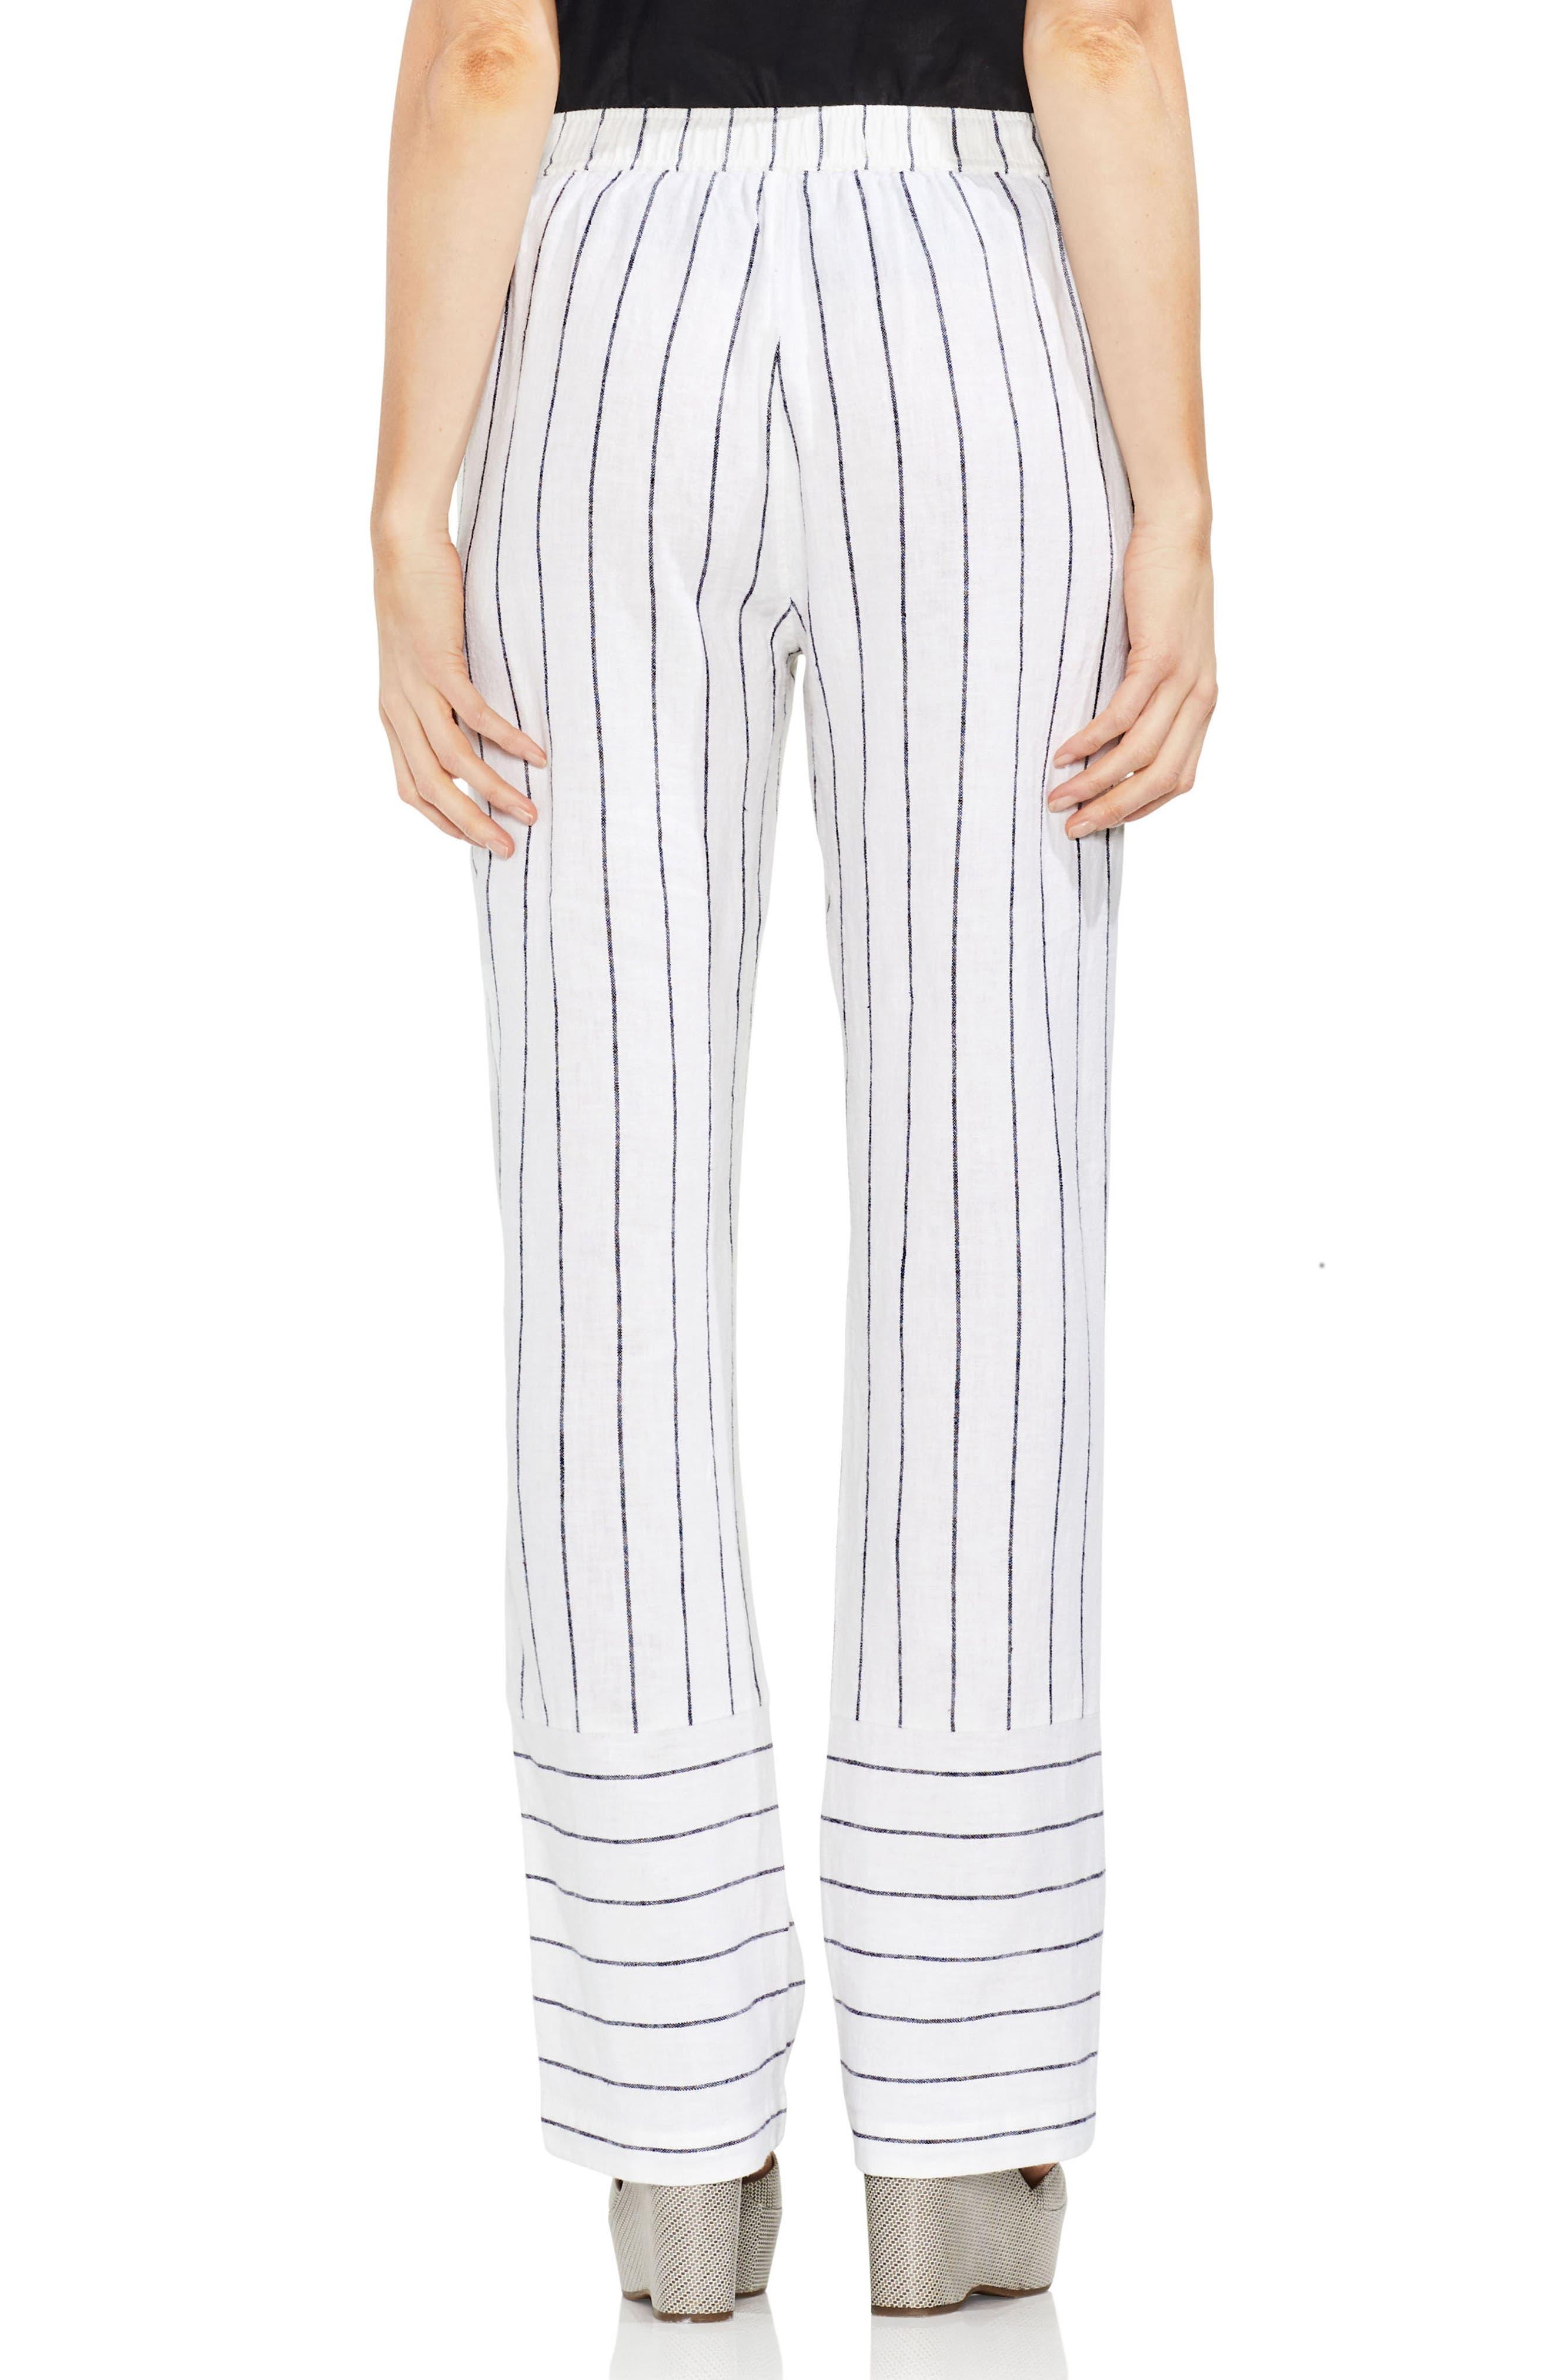 Pinstripe Linen Blend Drawstring Pants,                             Alternate thumbnail 2, color,                             Ultra White